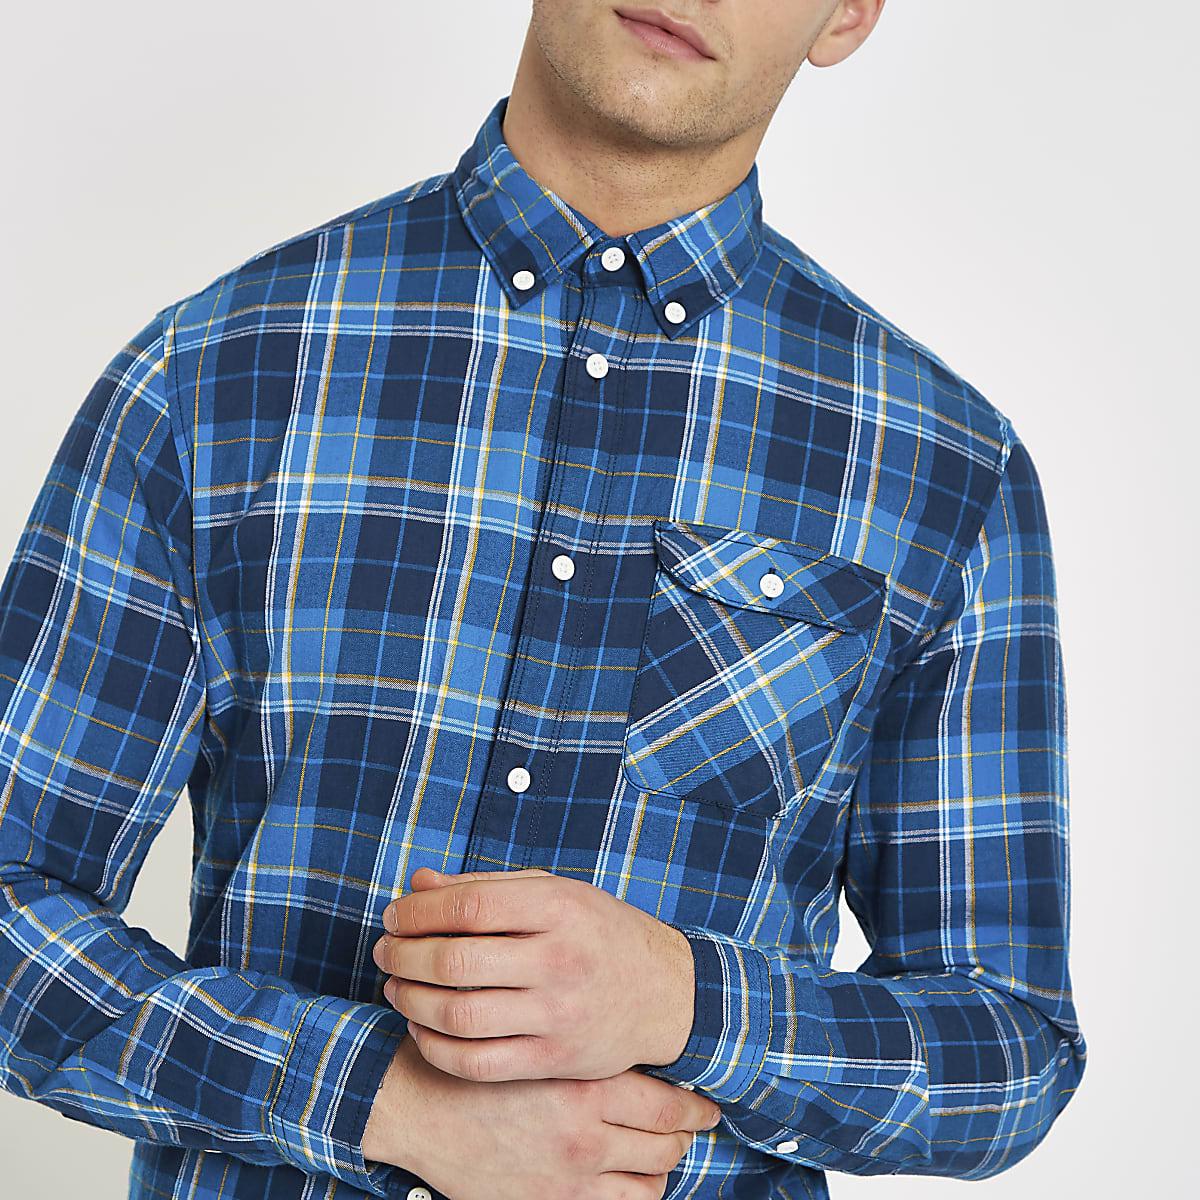 Jack & Jones blue check shirt